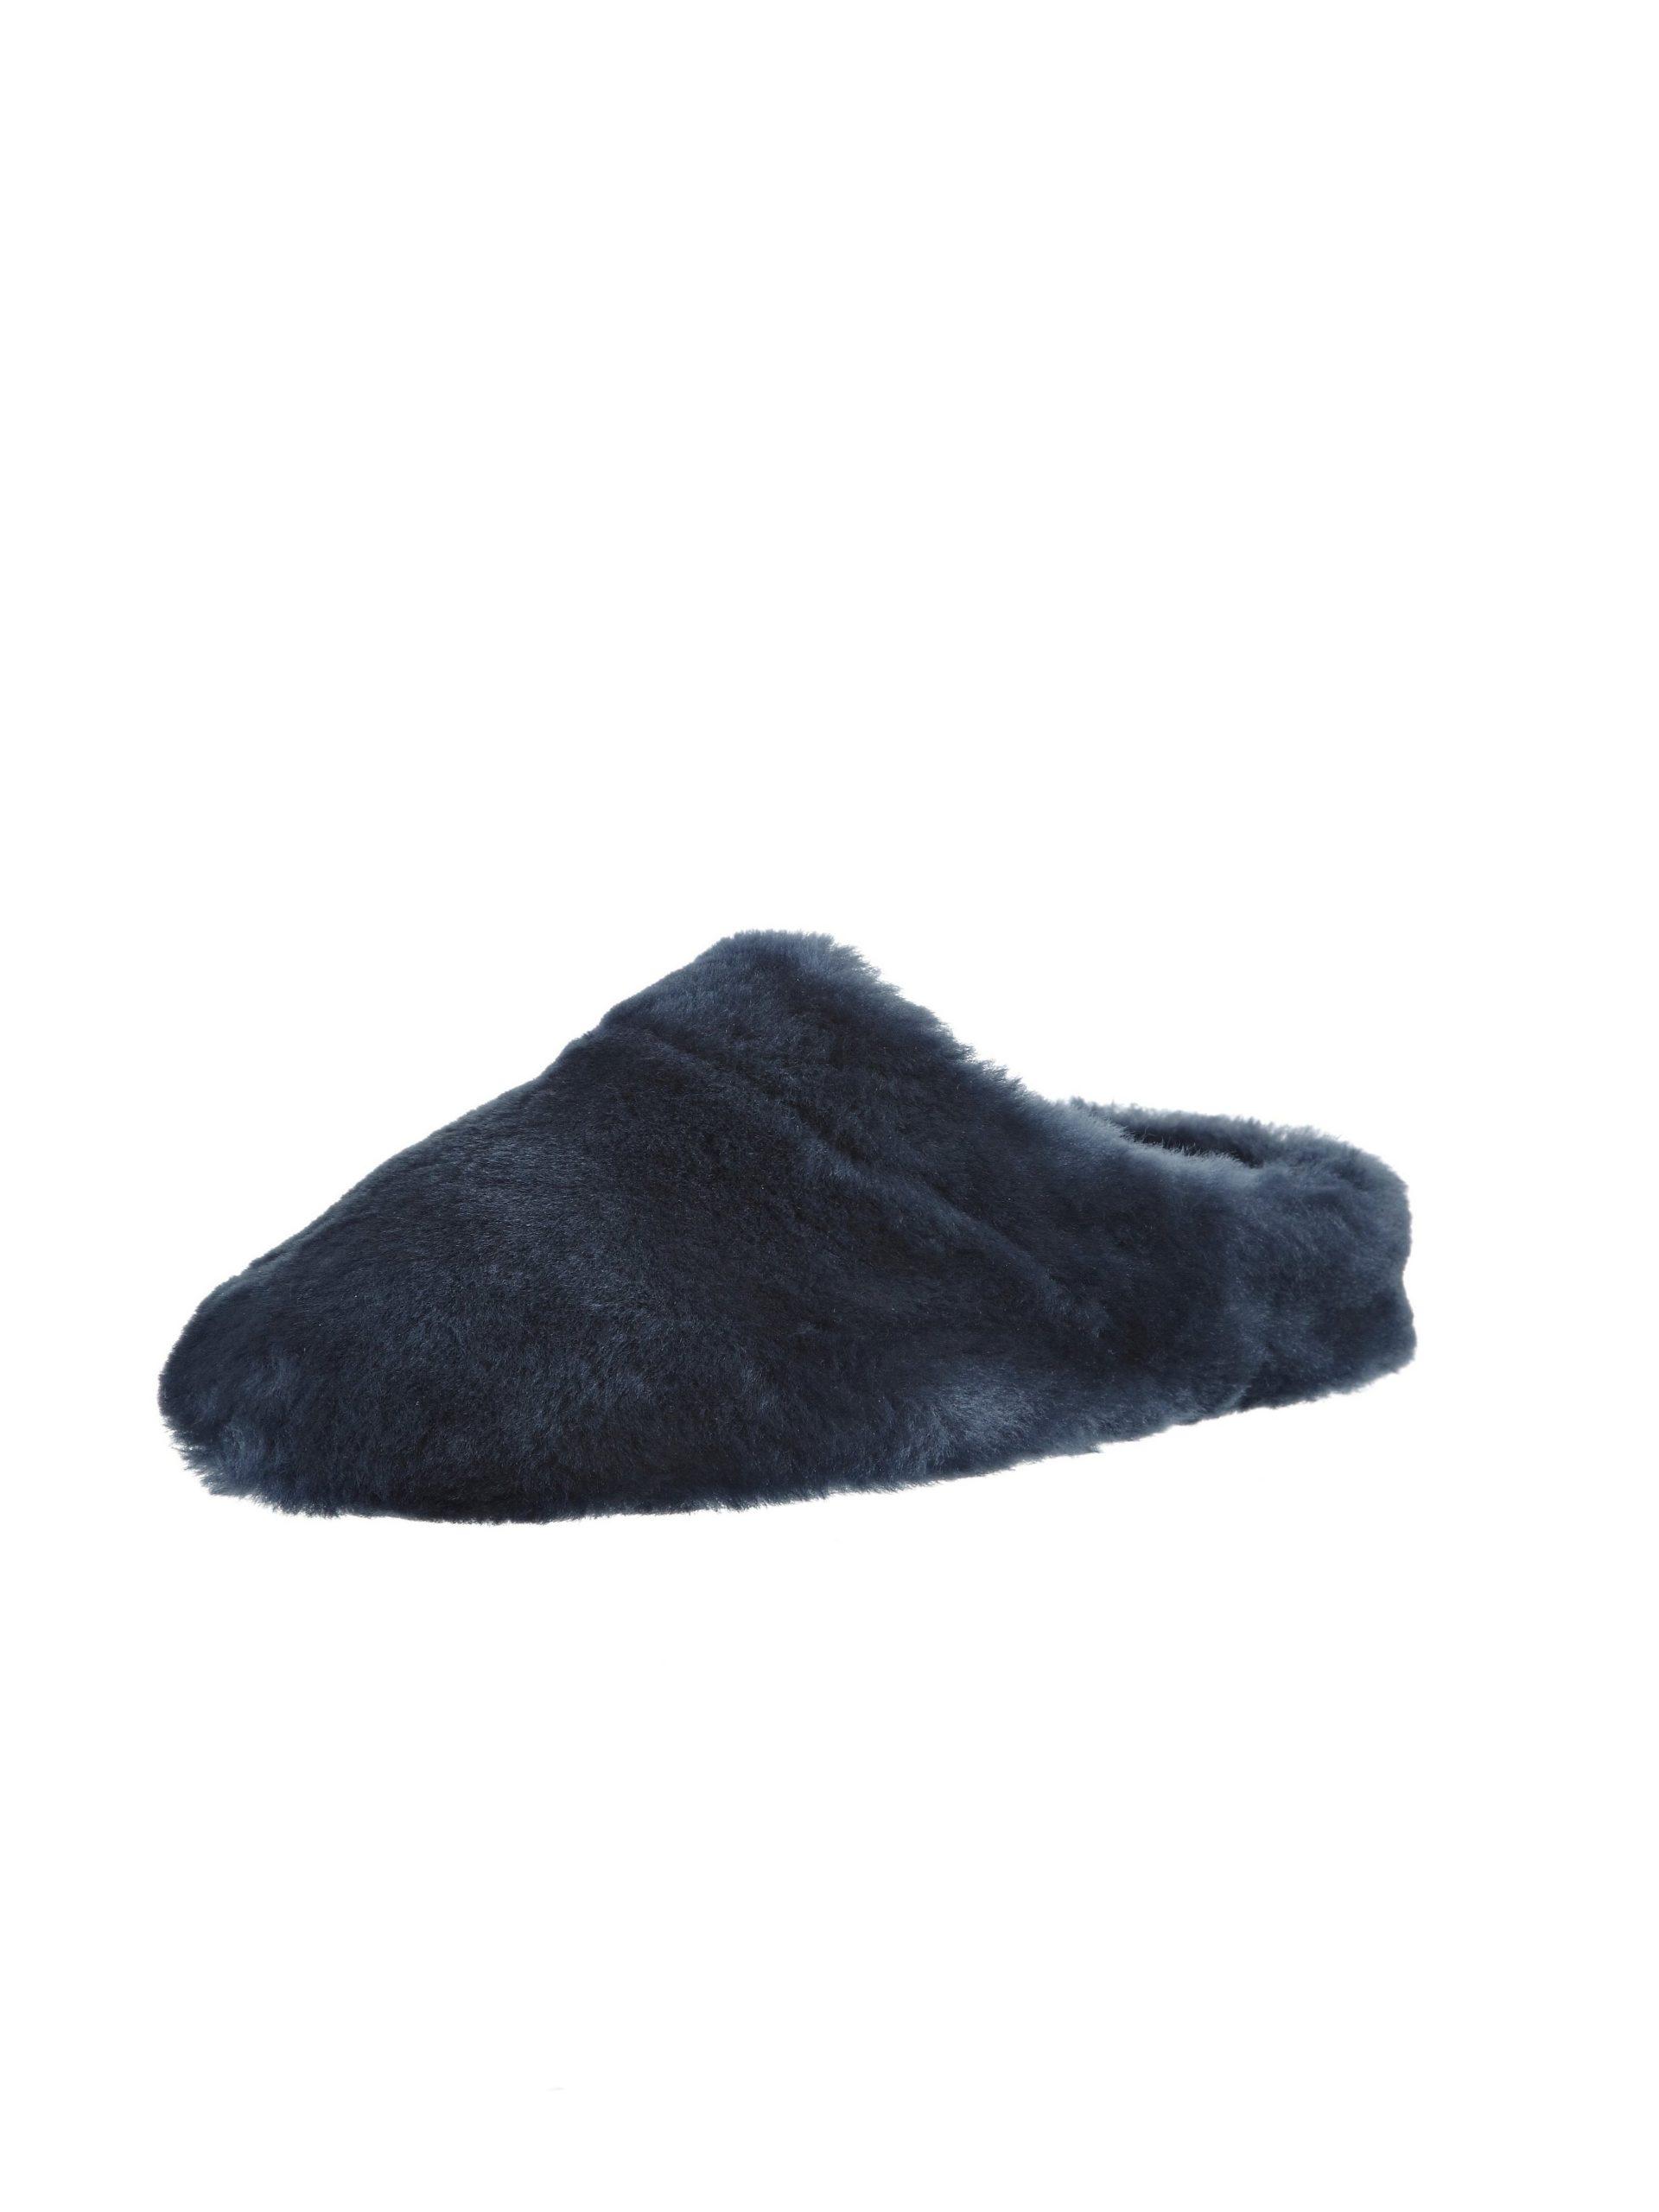 Lammypantoffels Van Giesswein blauw Kopen